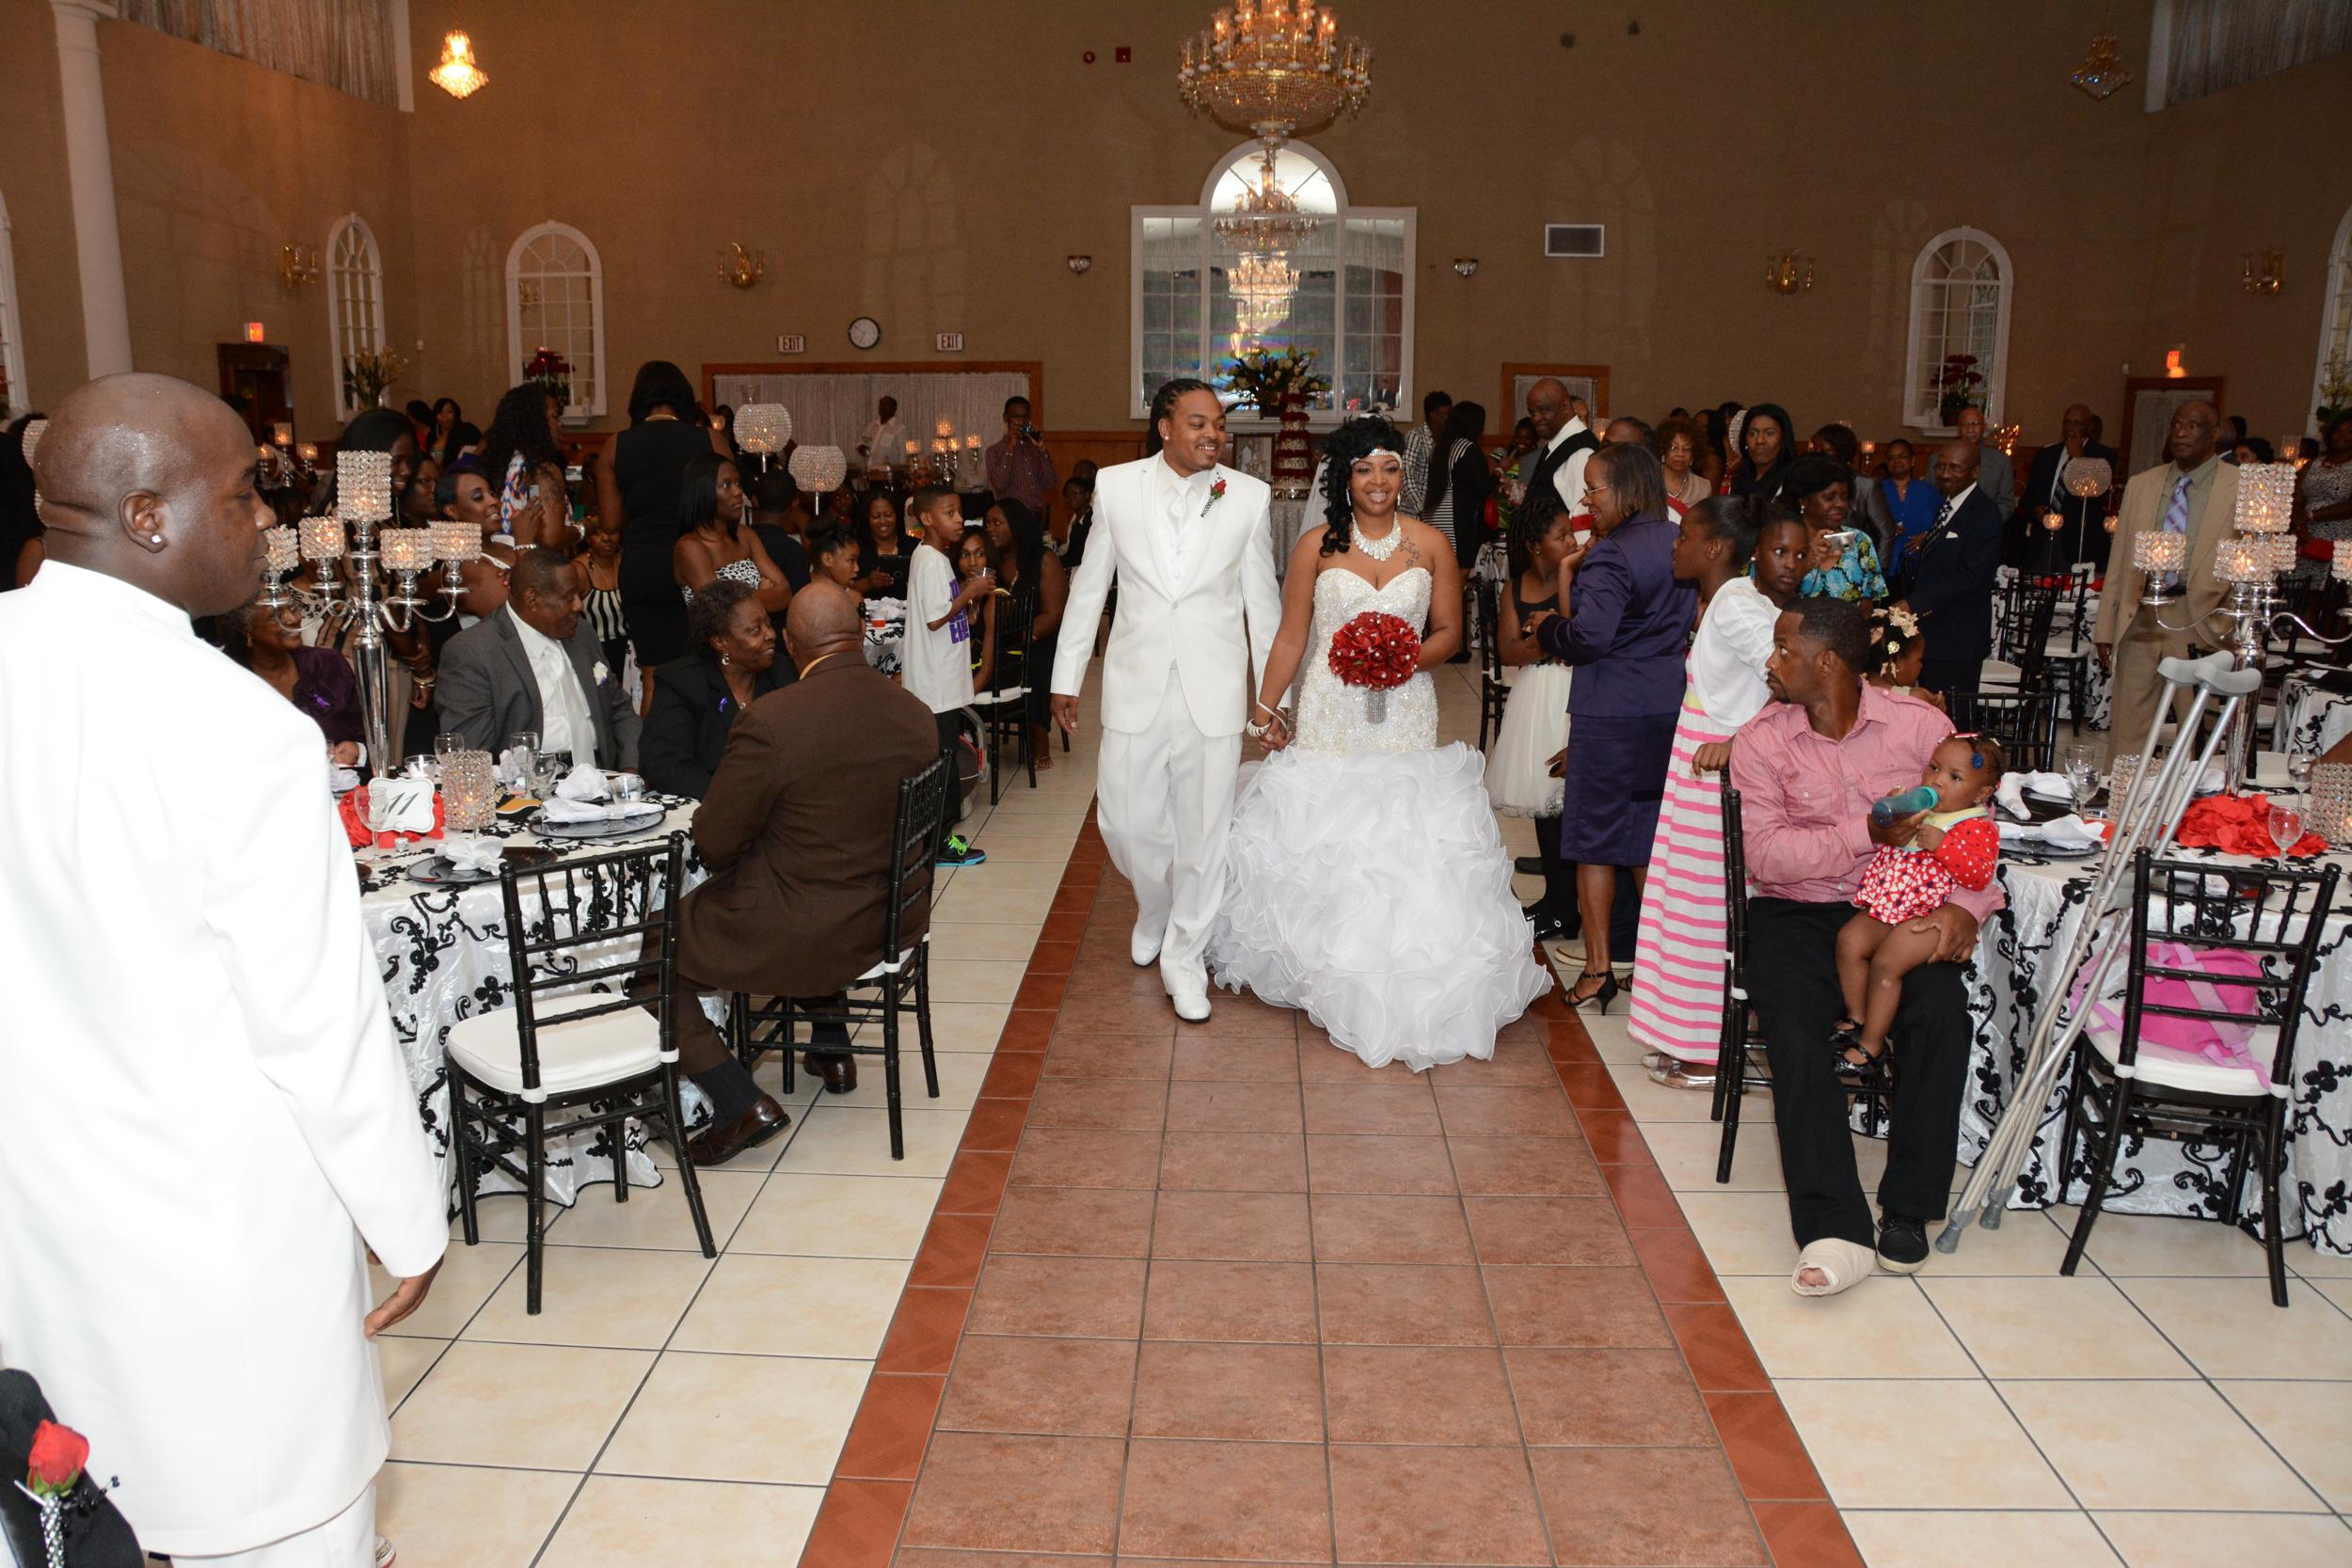 nola wedding-15.jpg